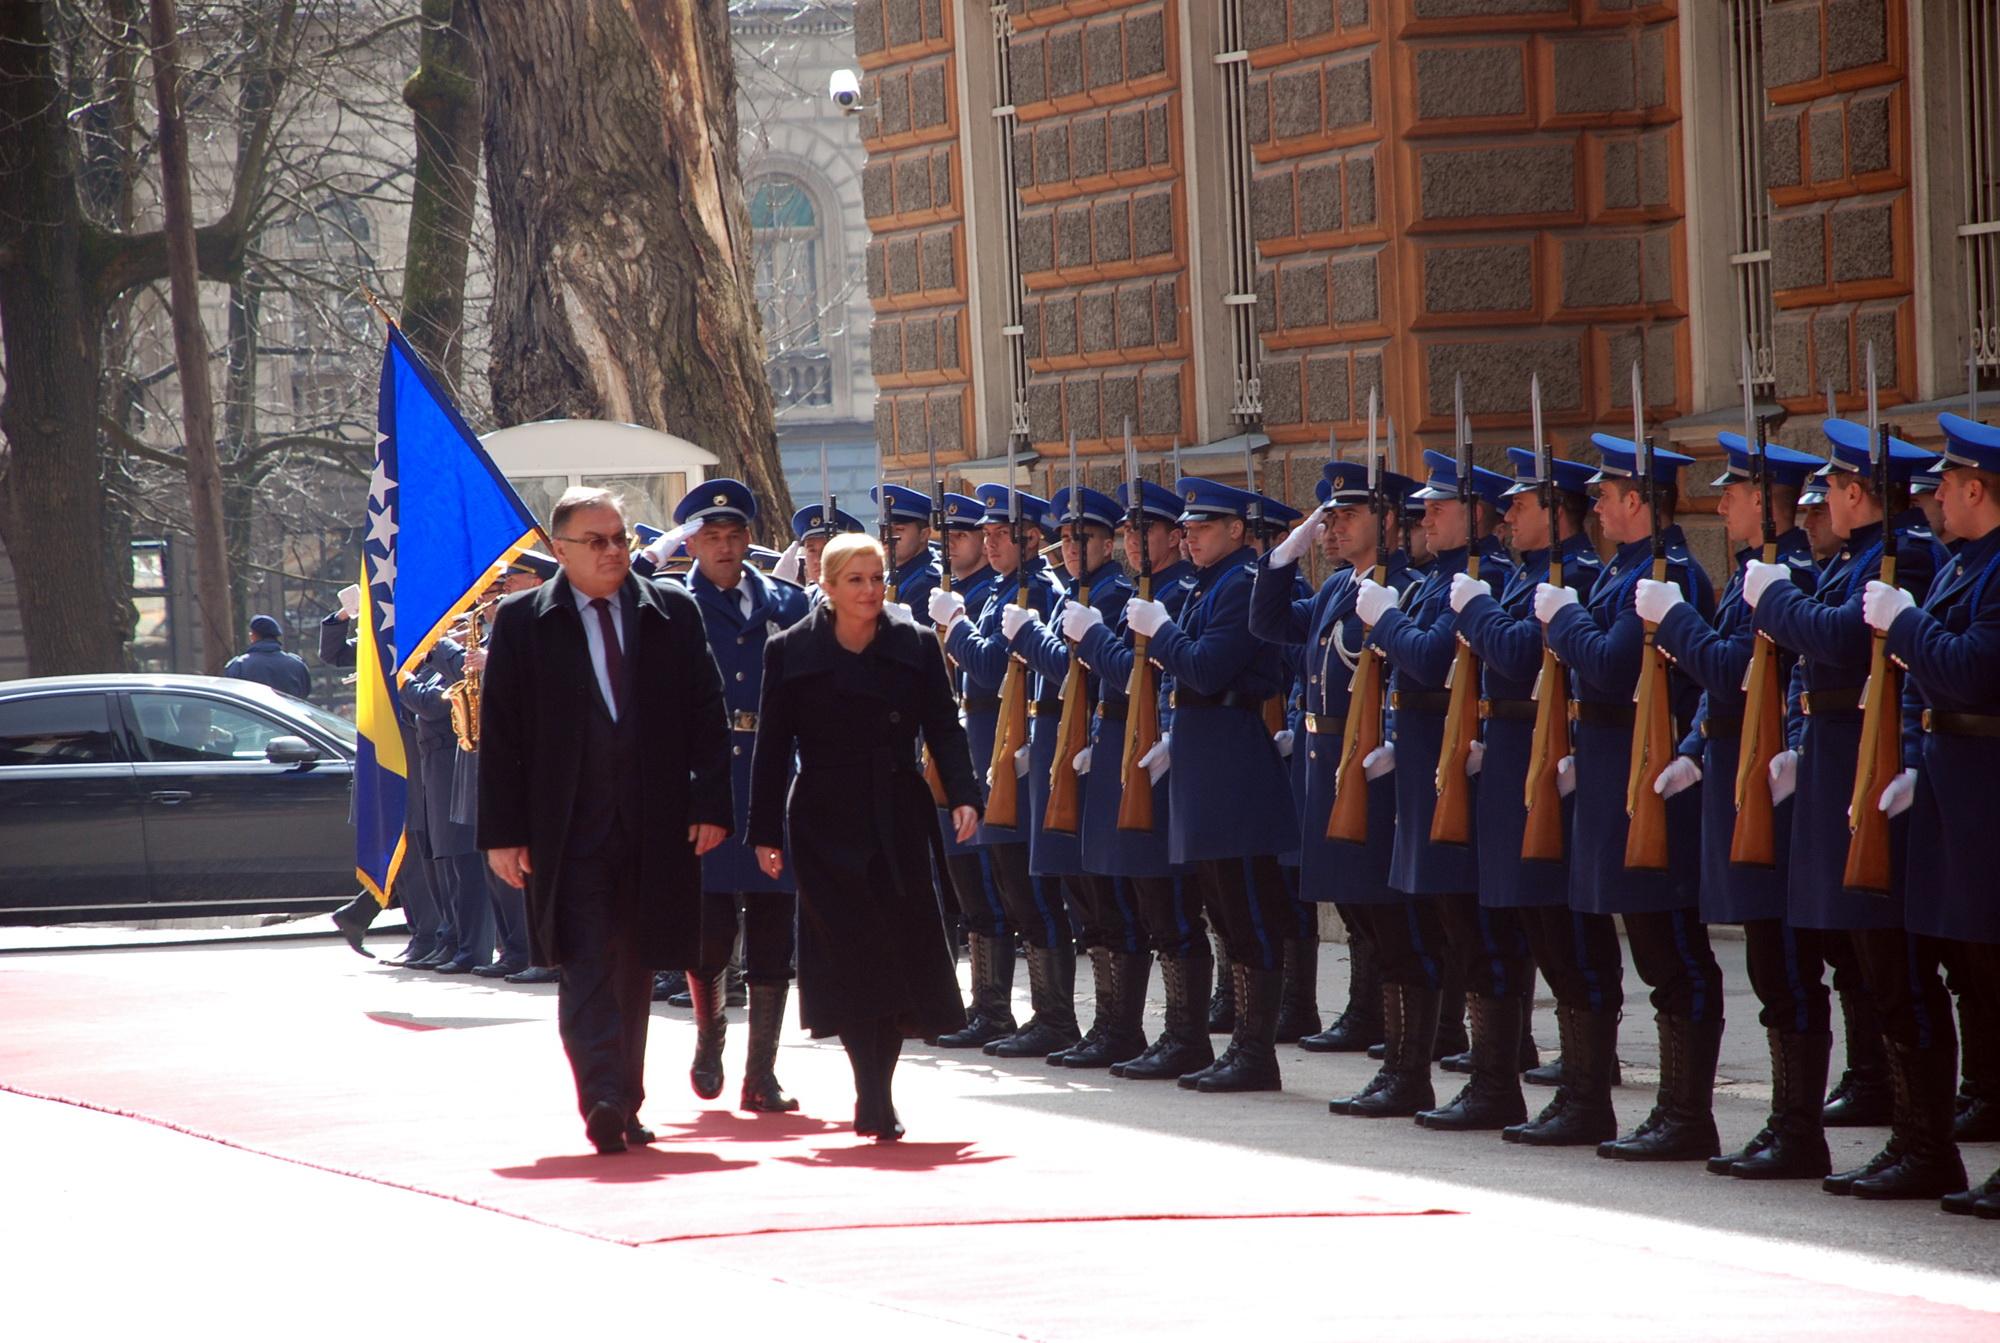 Grabar Kitarovic on an official visit to Sarajevo